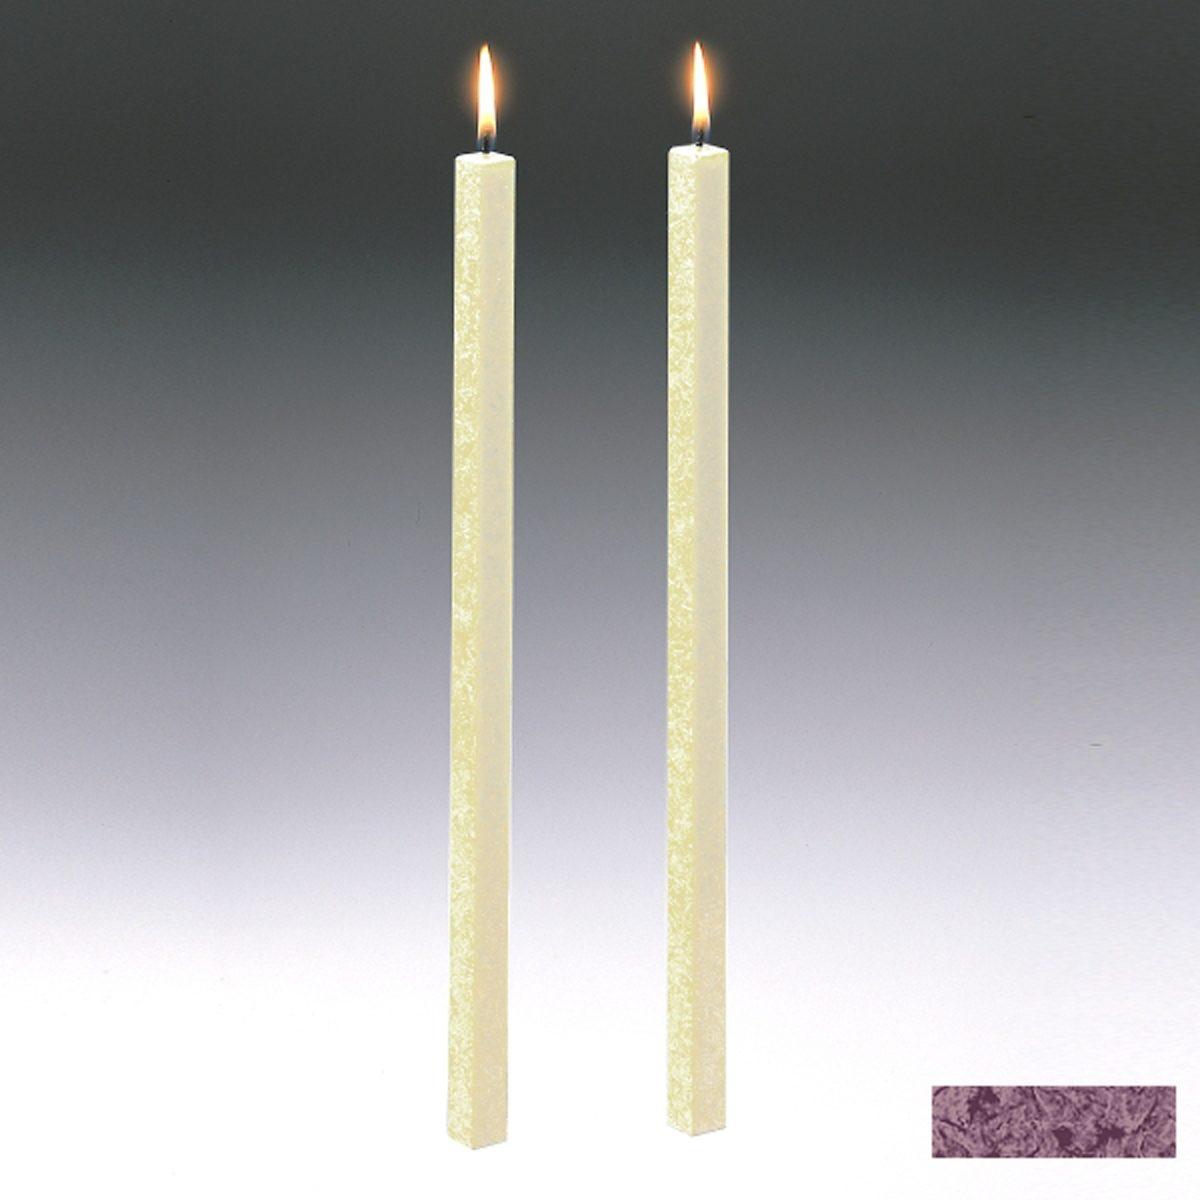 Amabiente Amabiente Kerze CLASSIC Fango 40cm - 2er Set